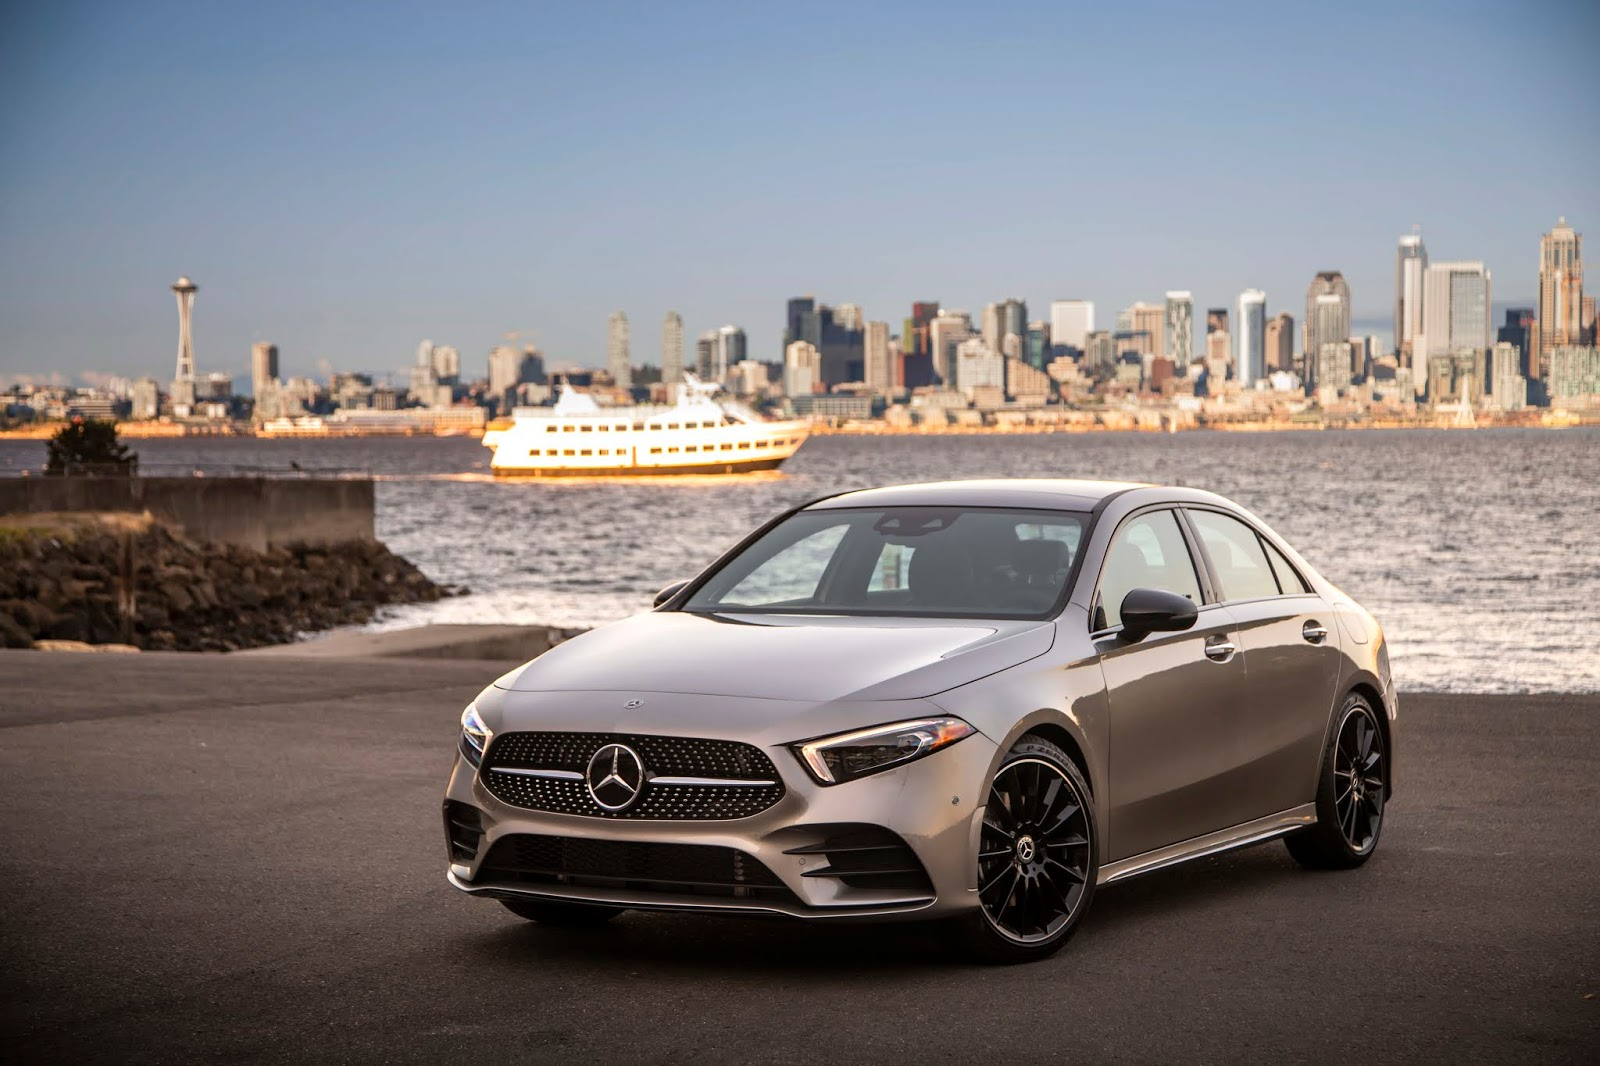 18C0777 001 Από 28.230 ευρώ η τιμή της Mercedes A-Class Sedan Luxury sedan, Mercedes, Mercedes AMG, premium sedan, sedan, zblog, καινούργιο, καινούρια, τιμες